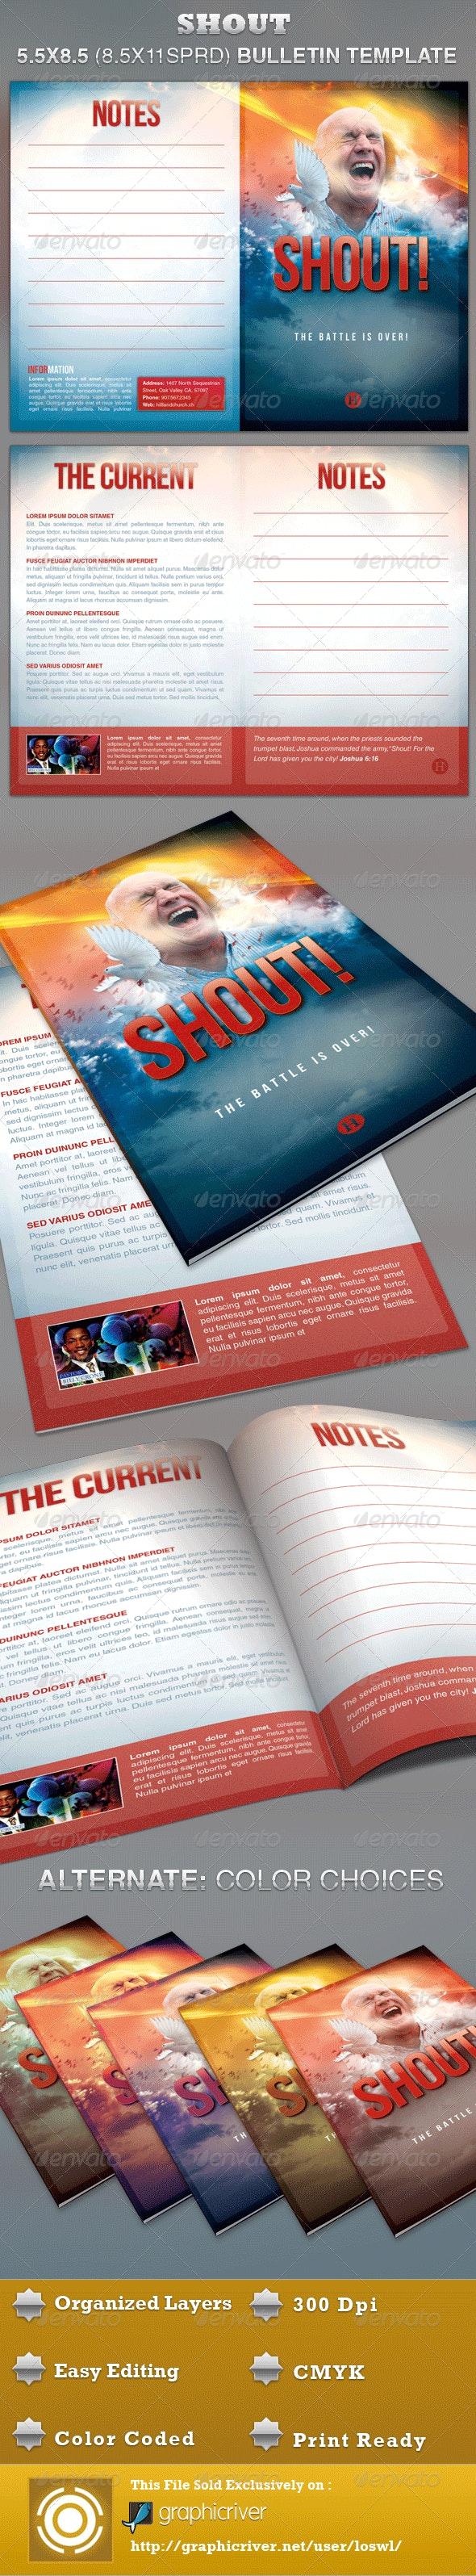 Shout Church Bulletin Template - Informational Brochures